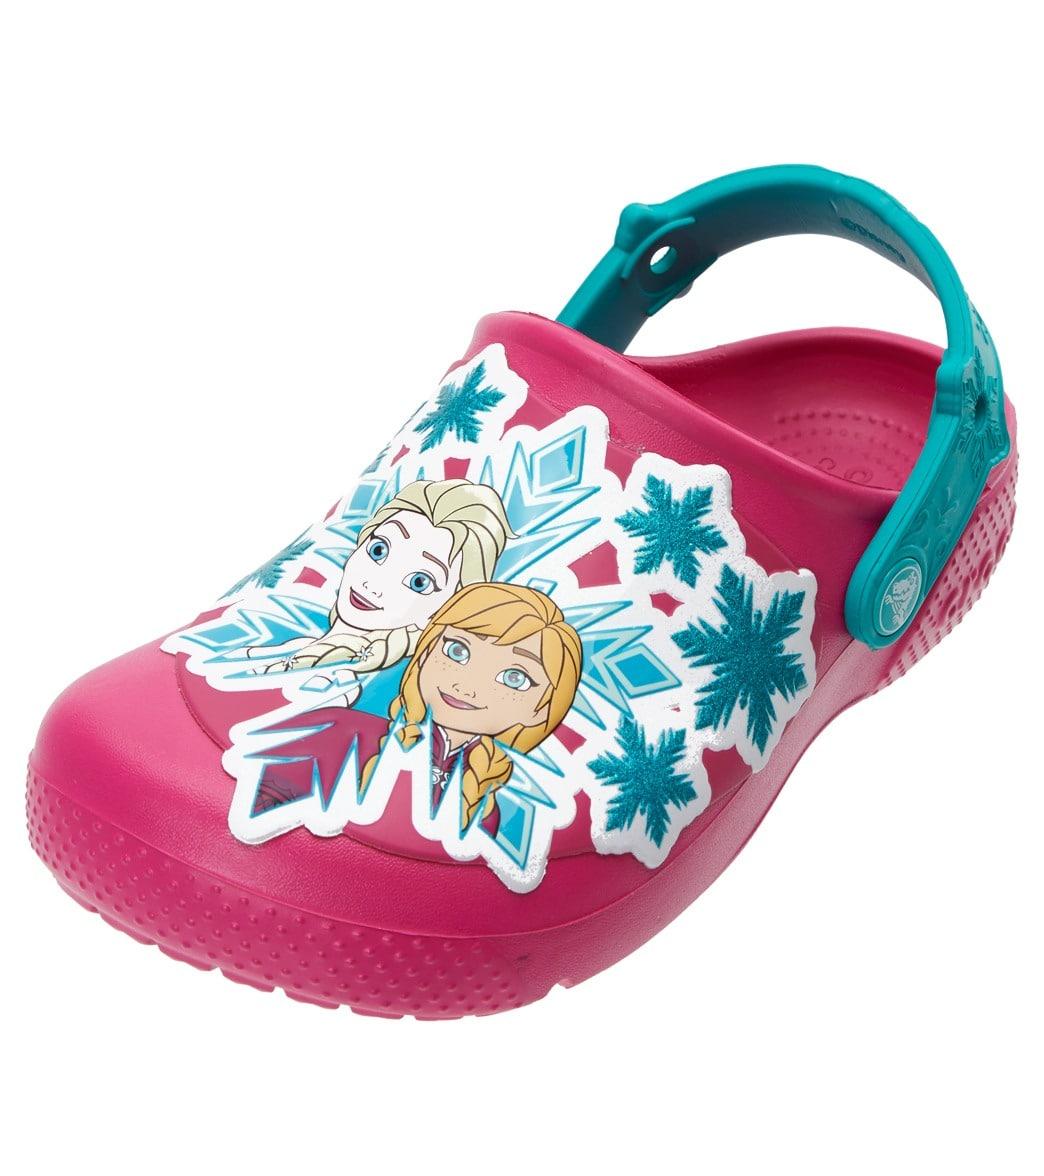 0427ca0d18de Crocs Kids  Crocs Fun Lab Frozen™ Clogs (Toddler